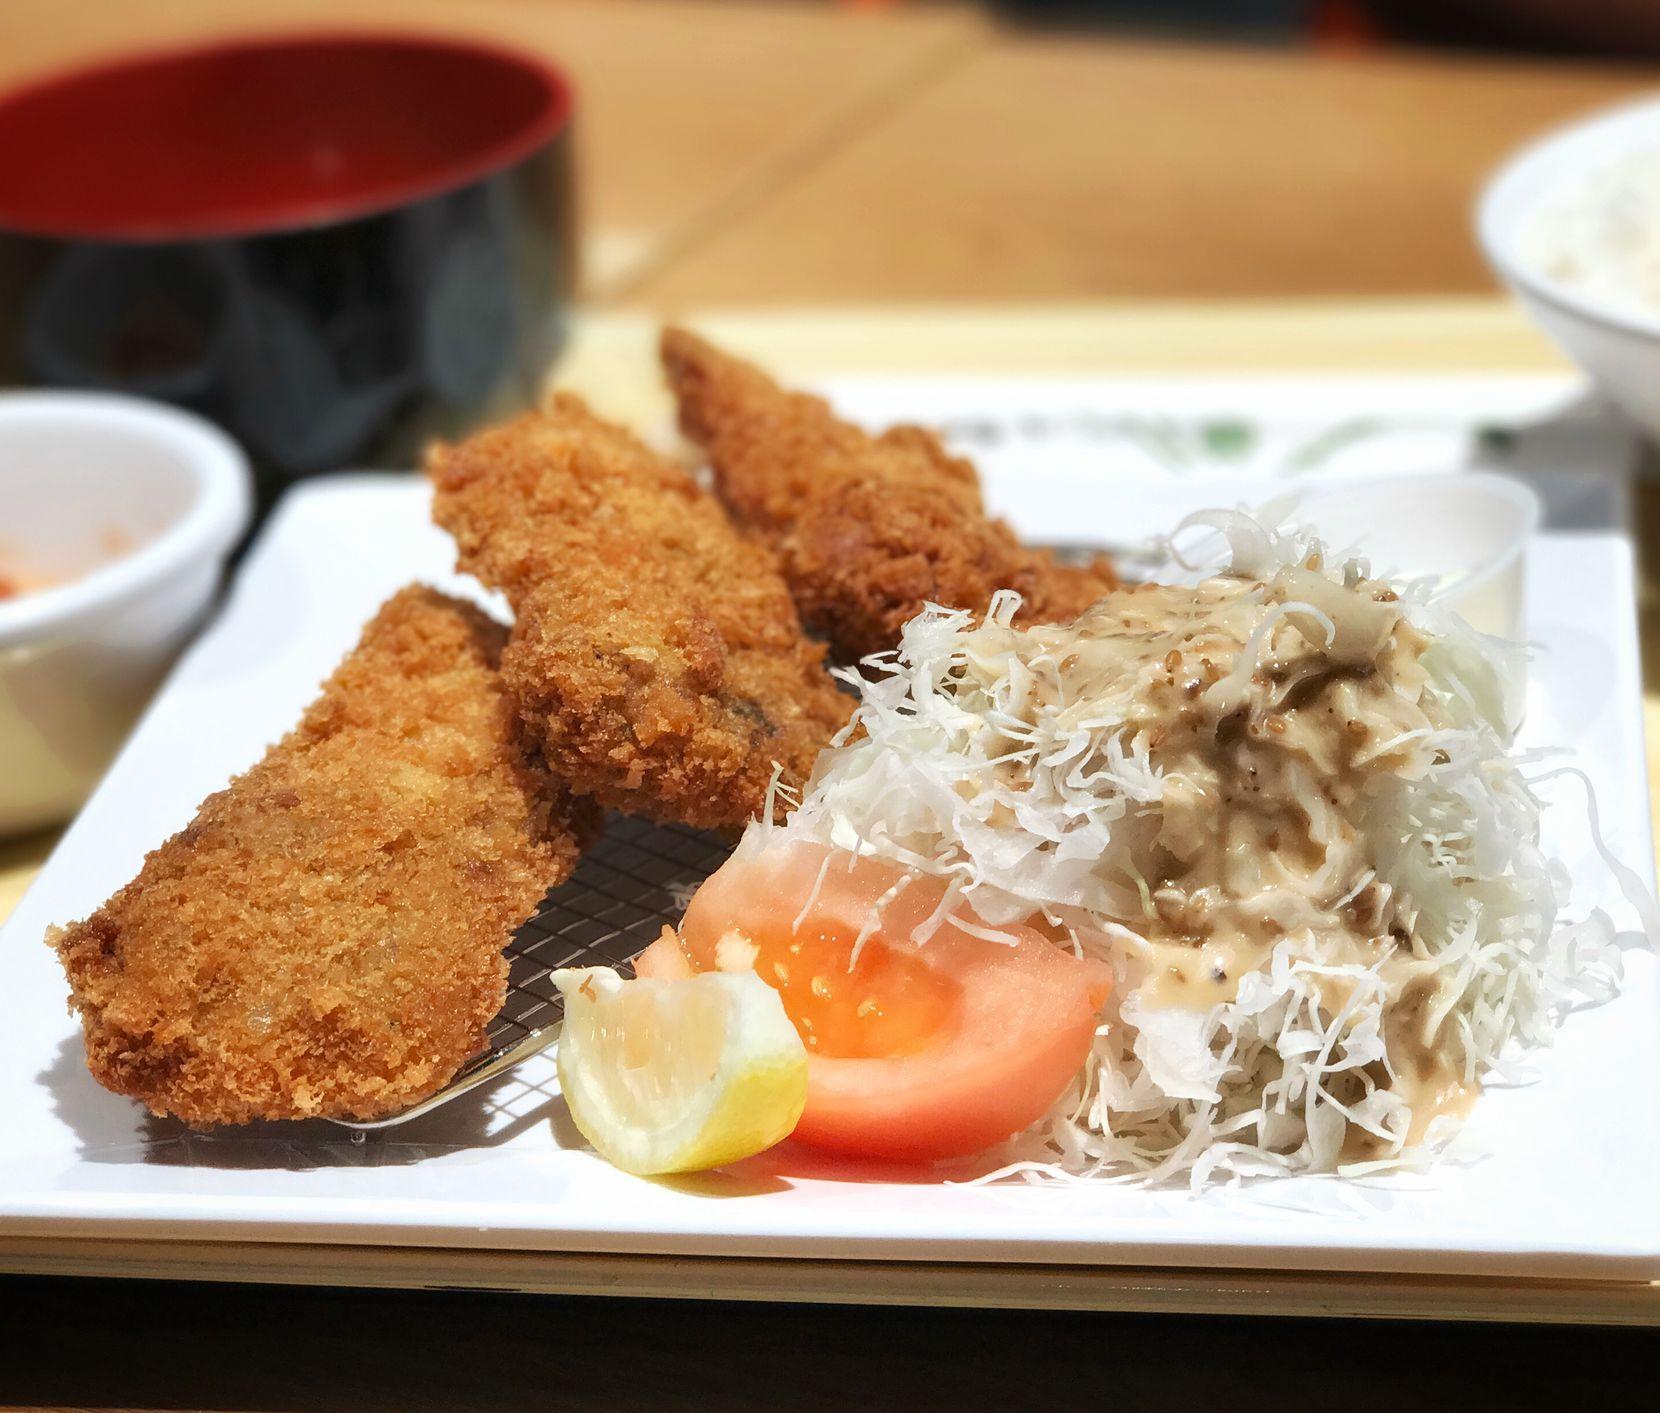 Tonkatsu, served with traditional shredded cabbage garnish, at Tonkatsu Kaneda in Plano